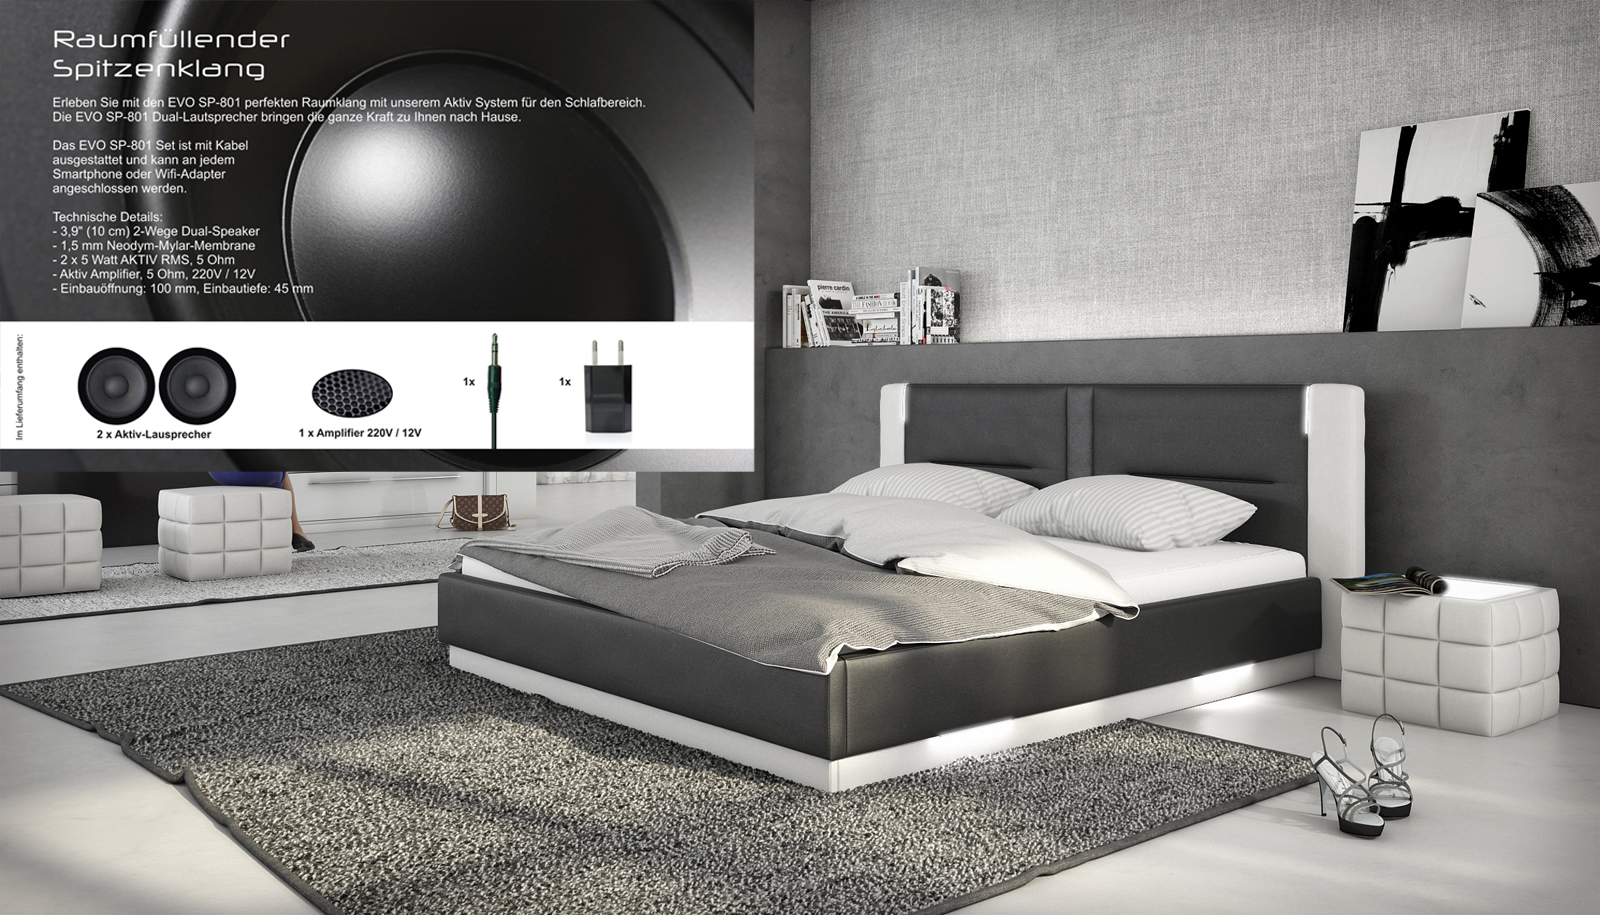 sam polsterbett 140 x 200 cm soundsystem schwarz wei santiago. Black Bedroom Furniture Sets. Home Design Ideas